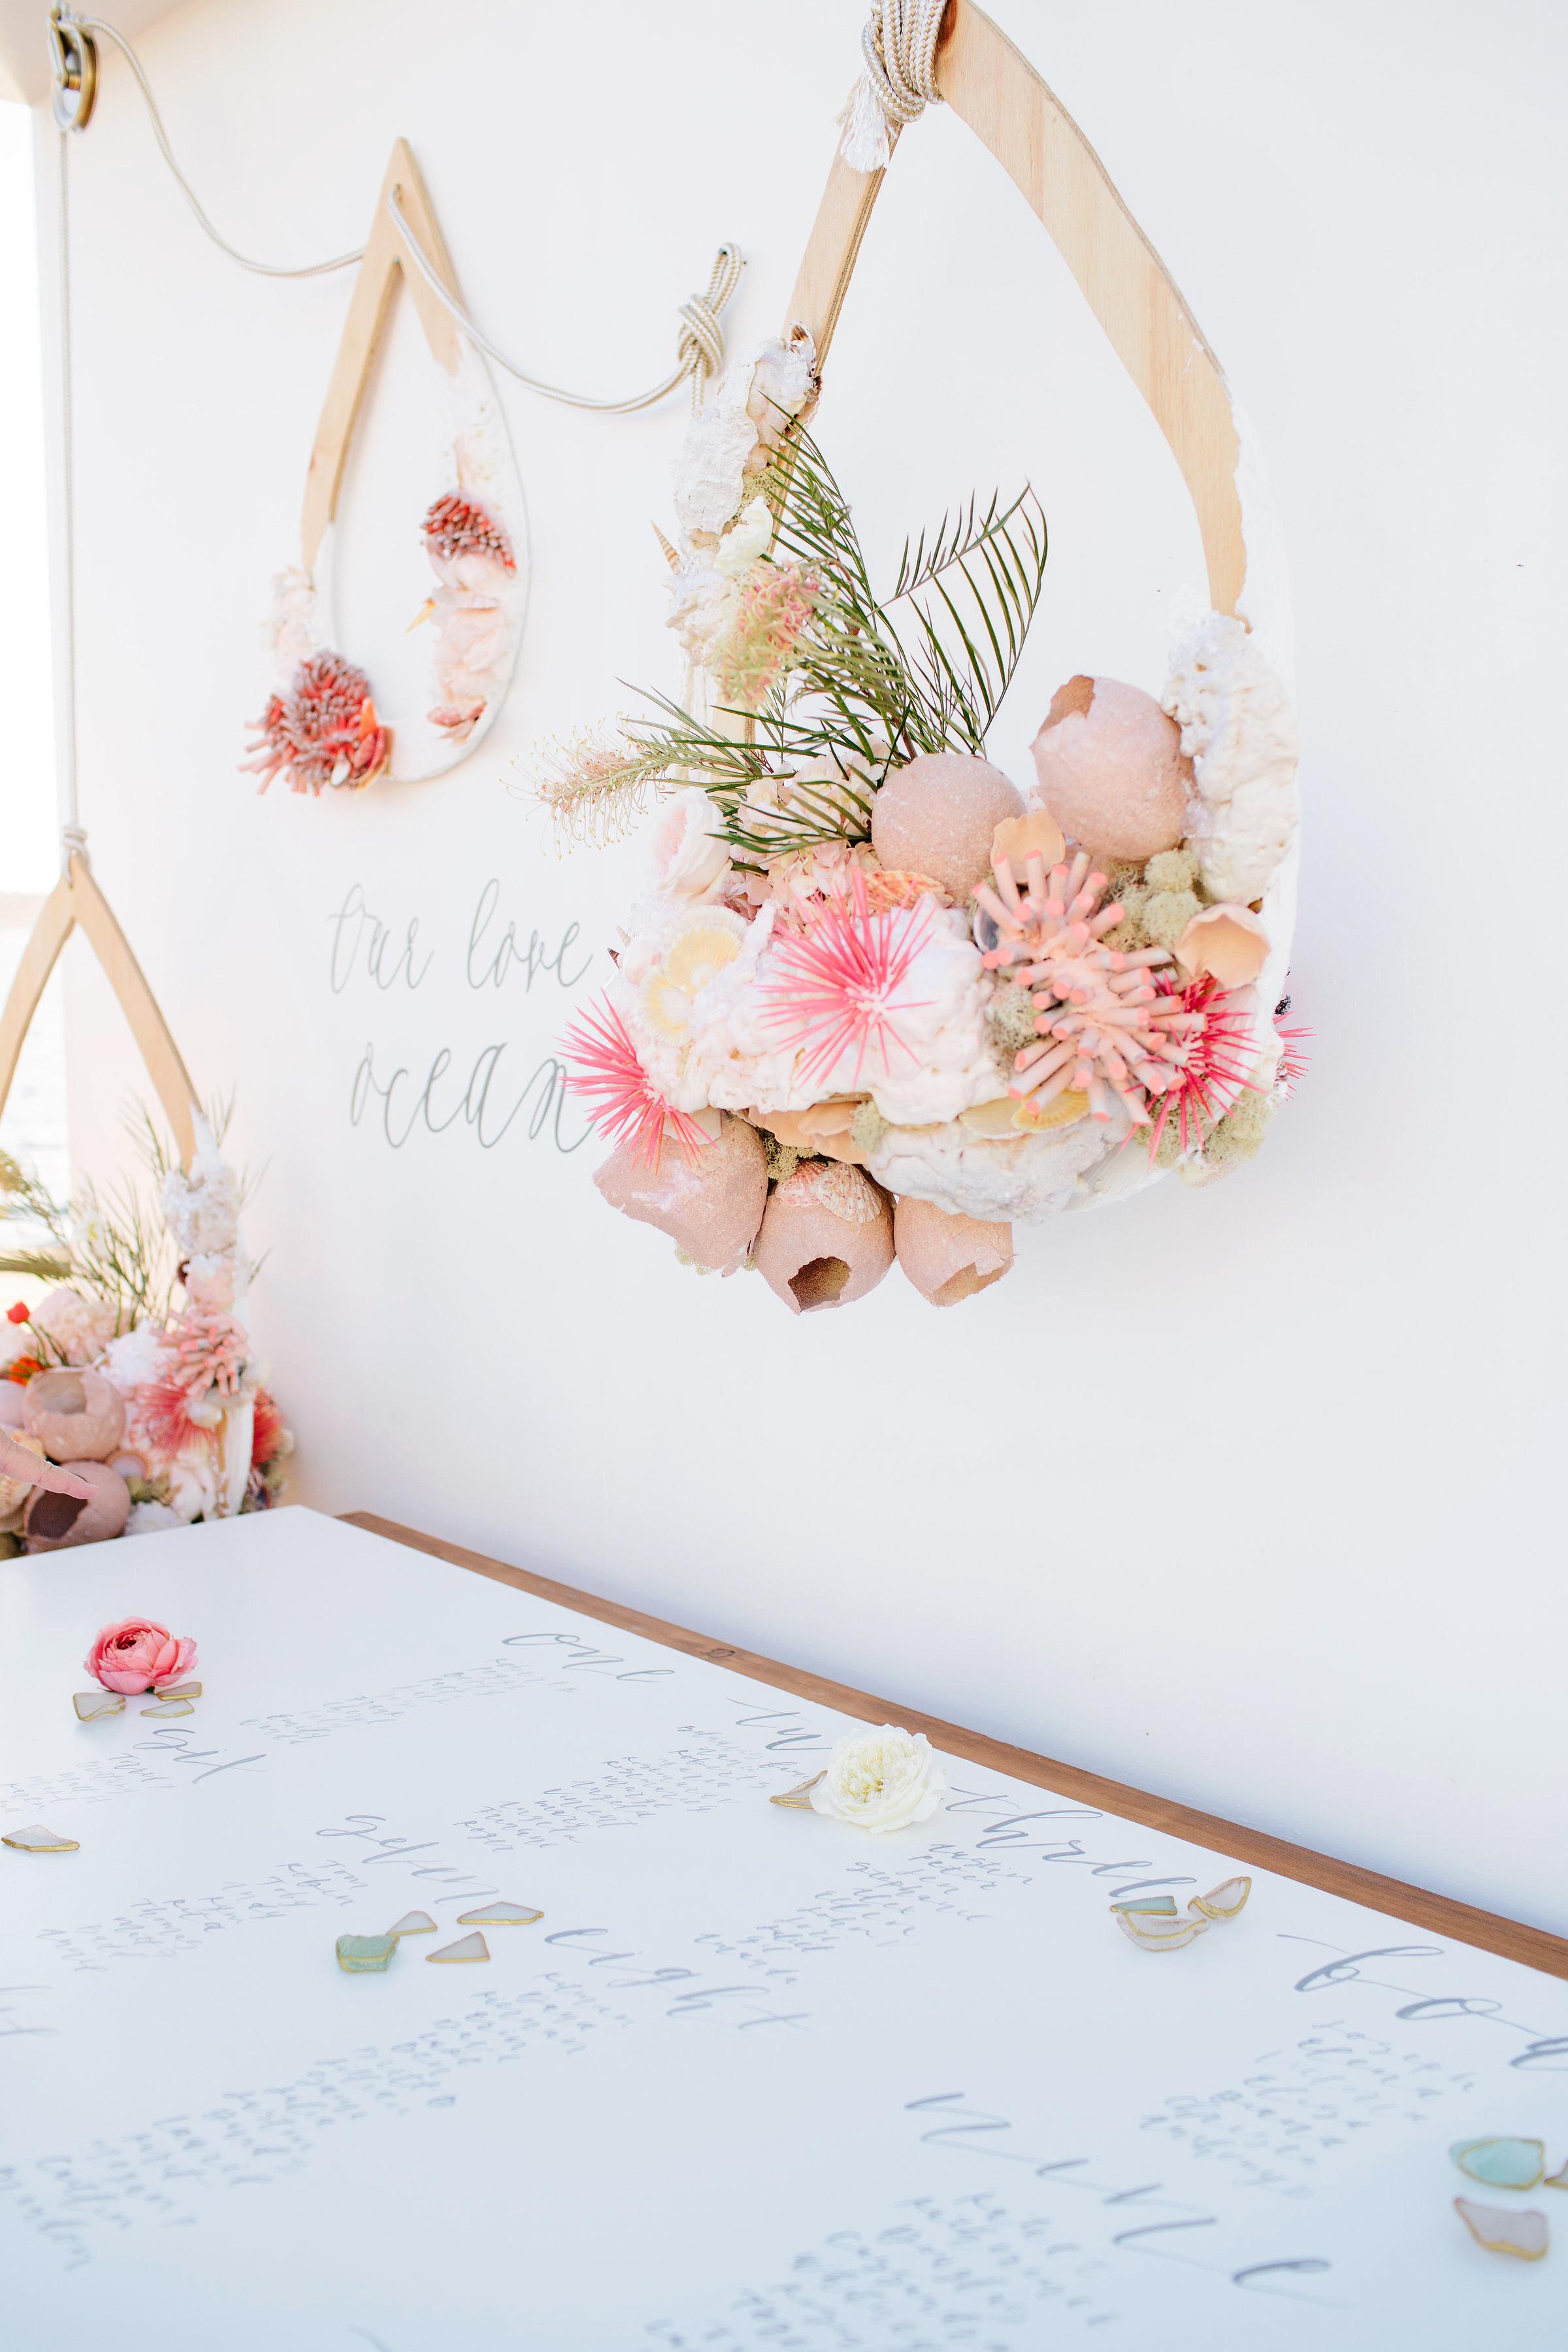 julie anthony real wedding decor